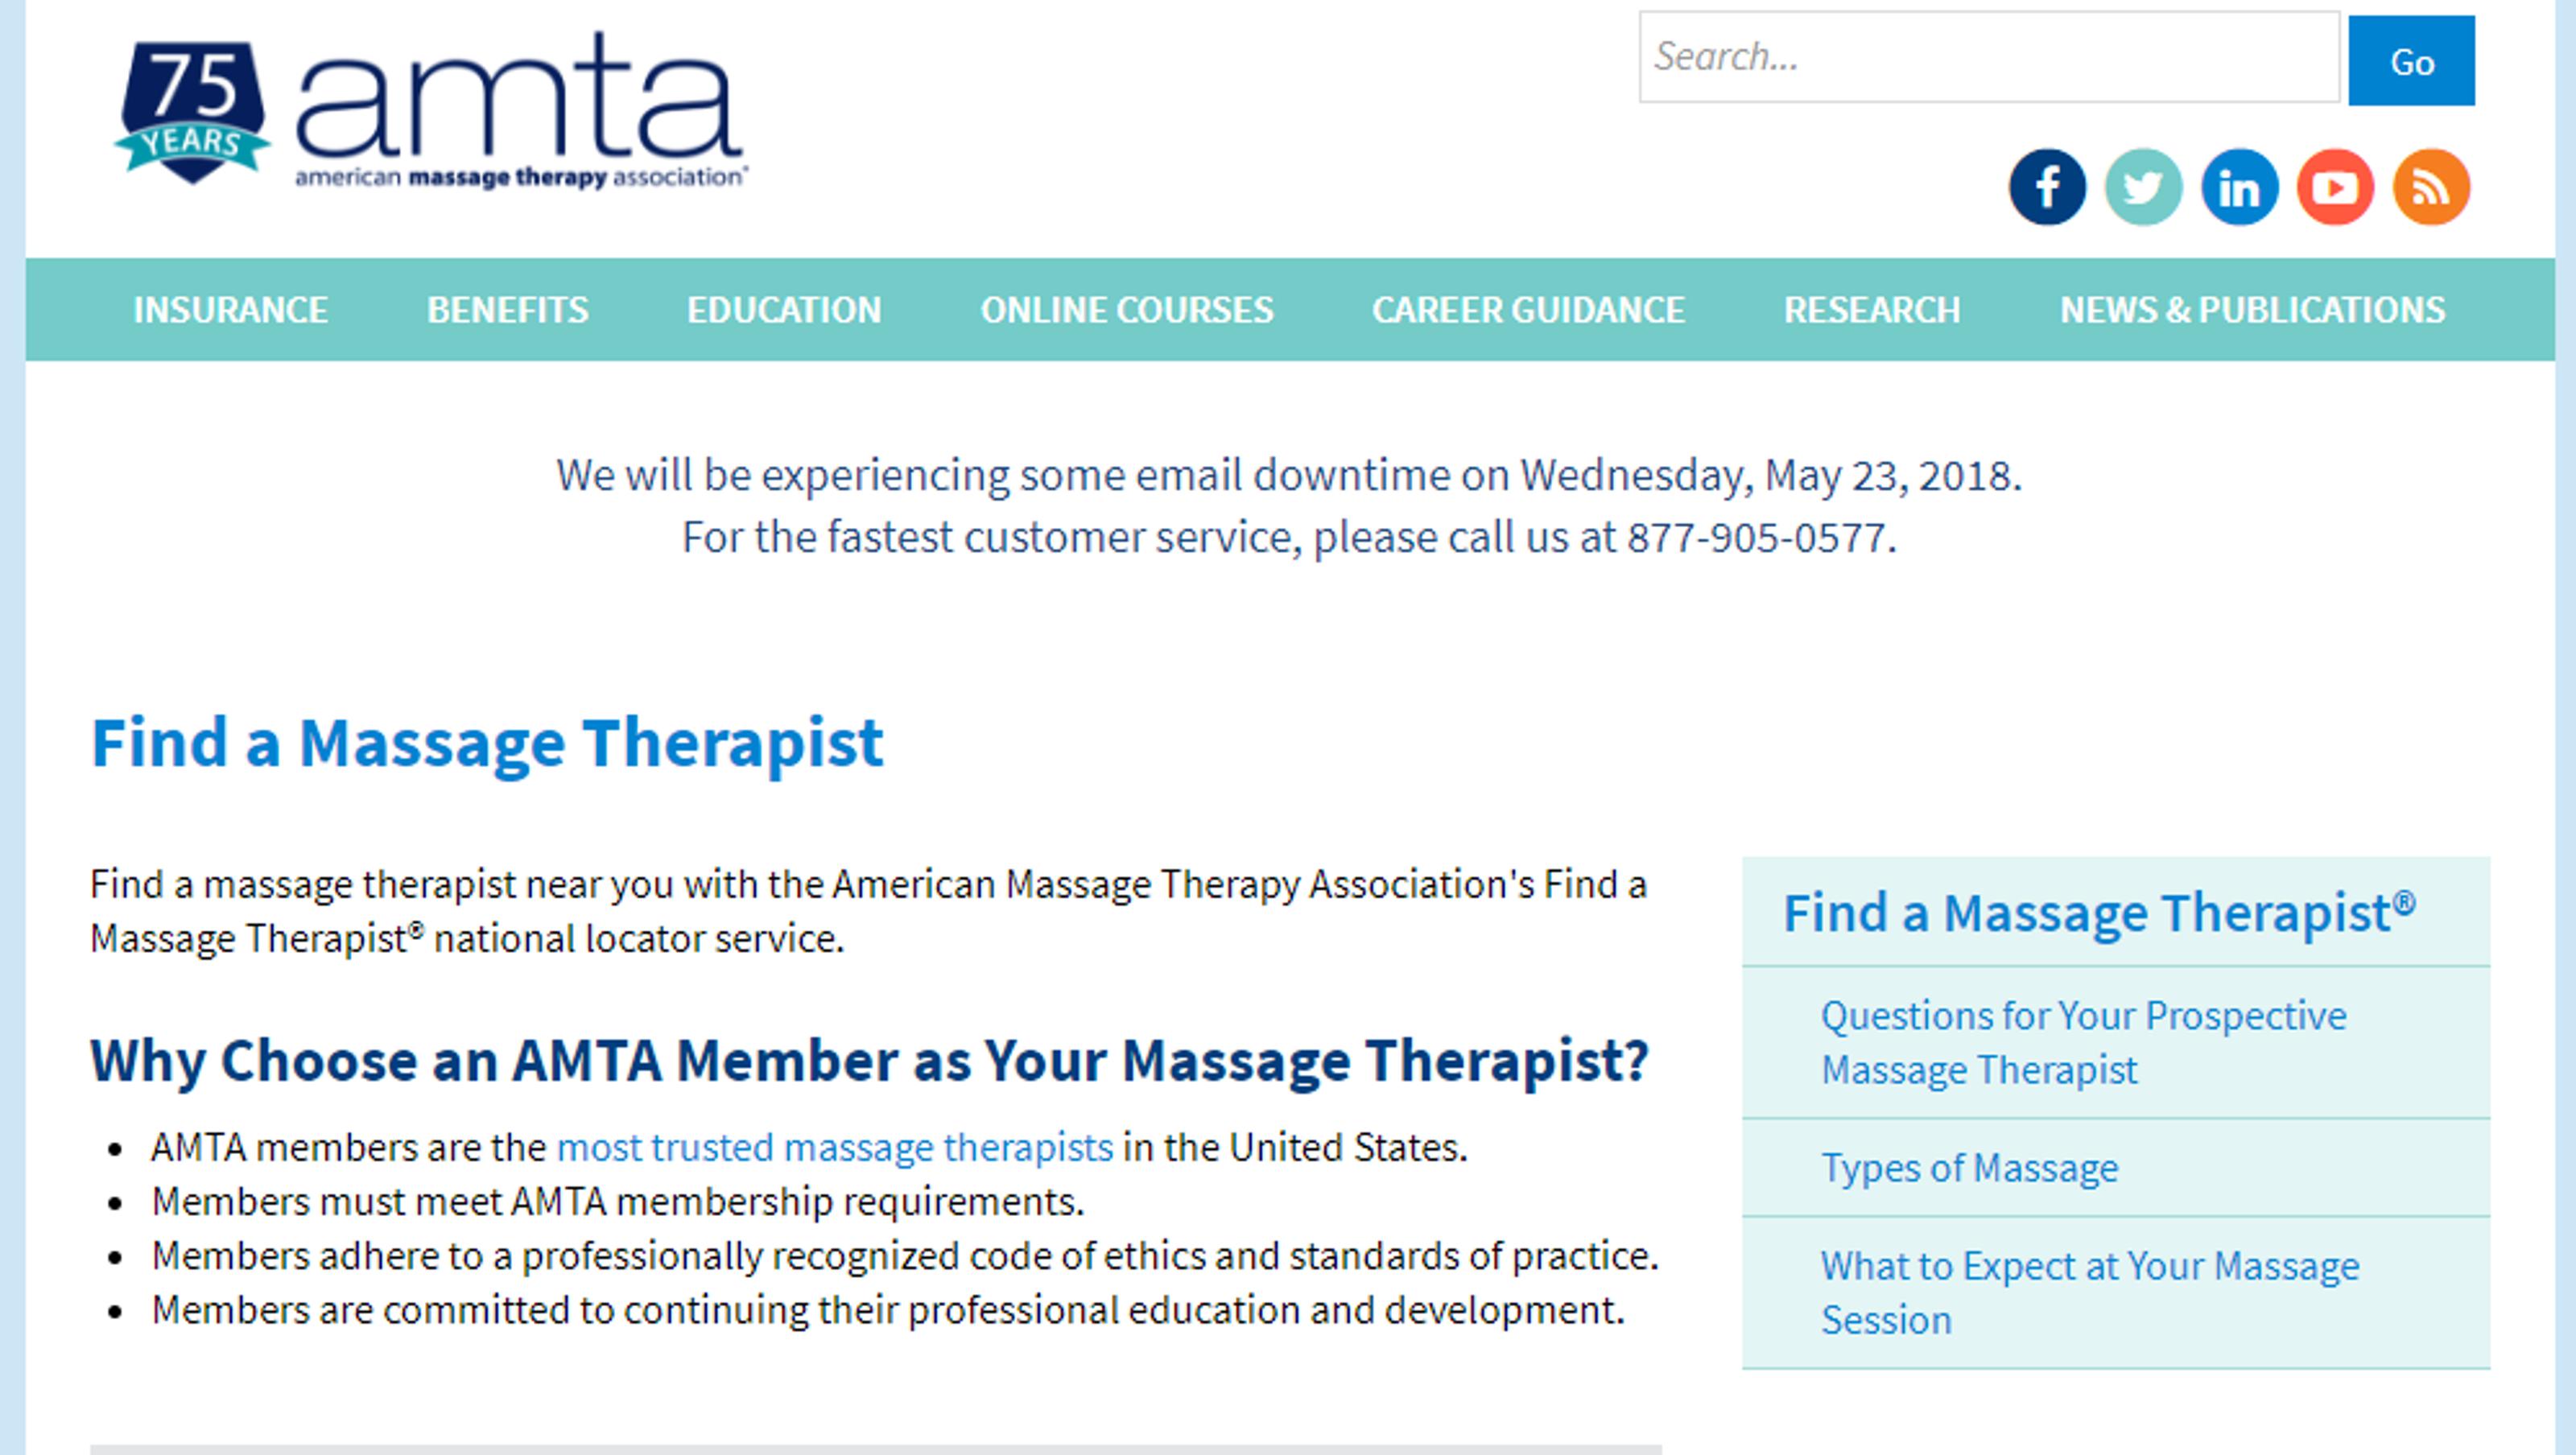 Minnesota S Lack Of Licensing Hurts Legitimate Massage Therapists